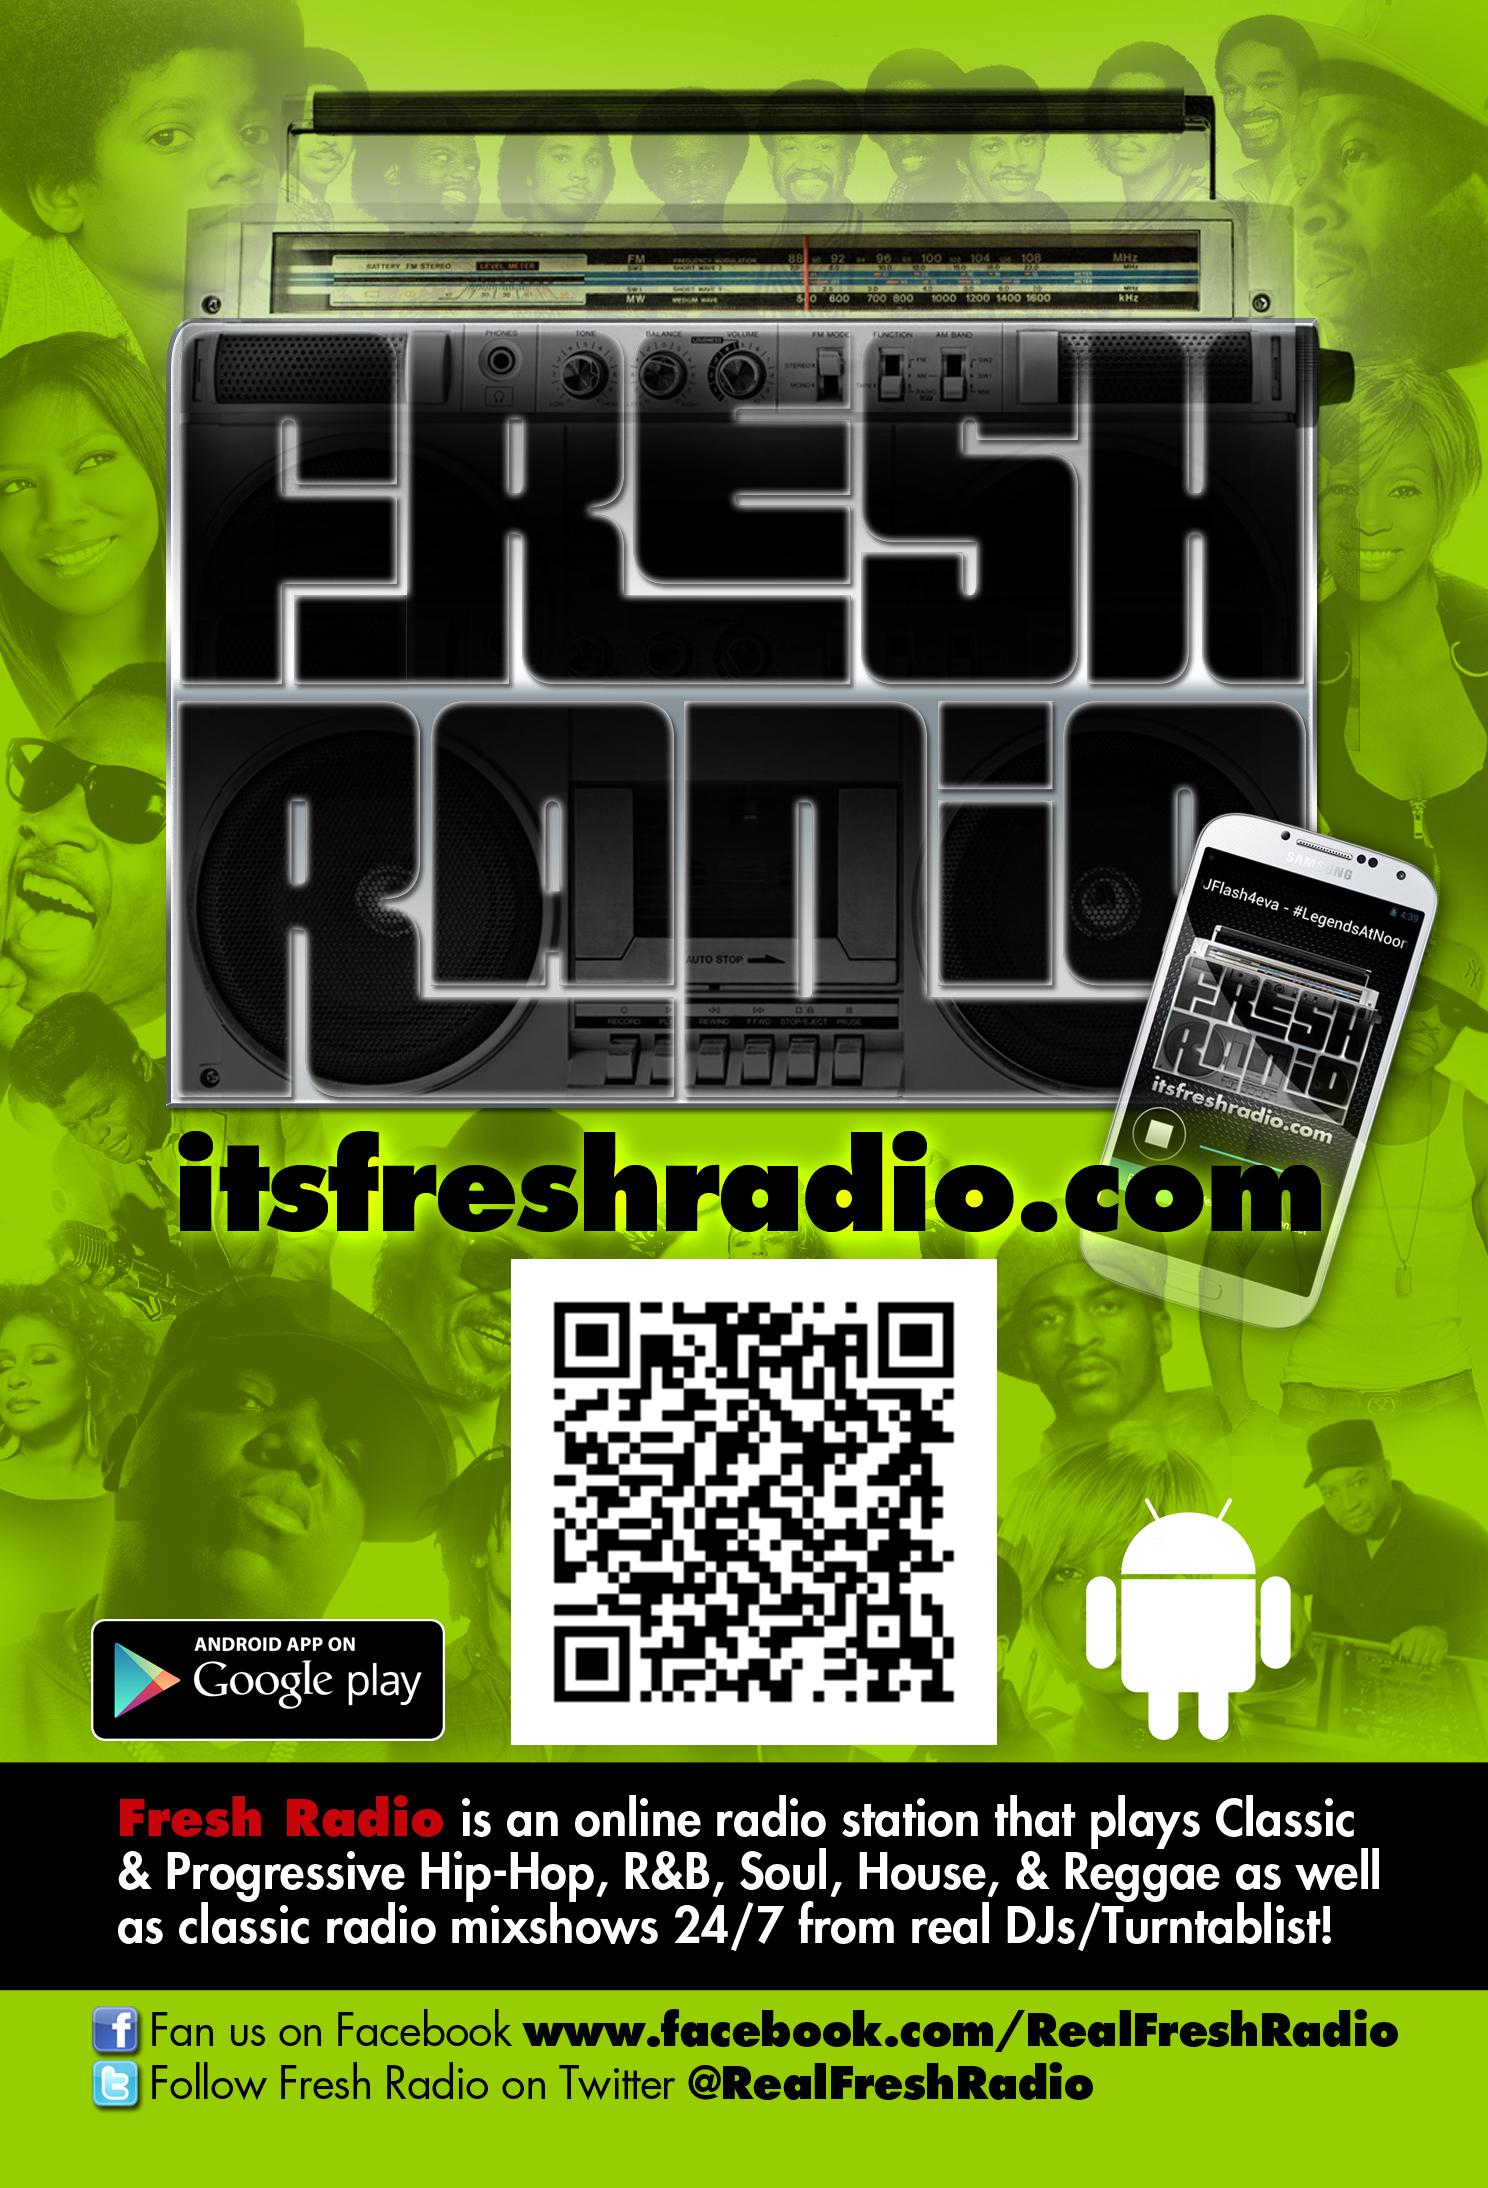 freshdroid_flyer